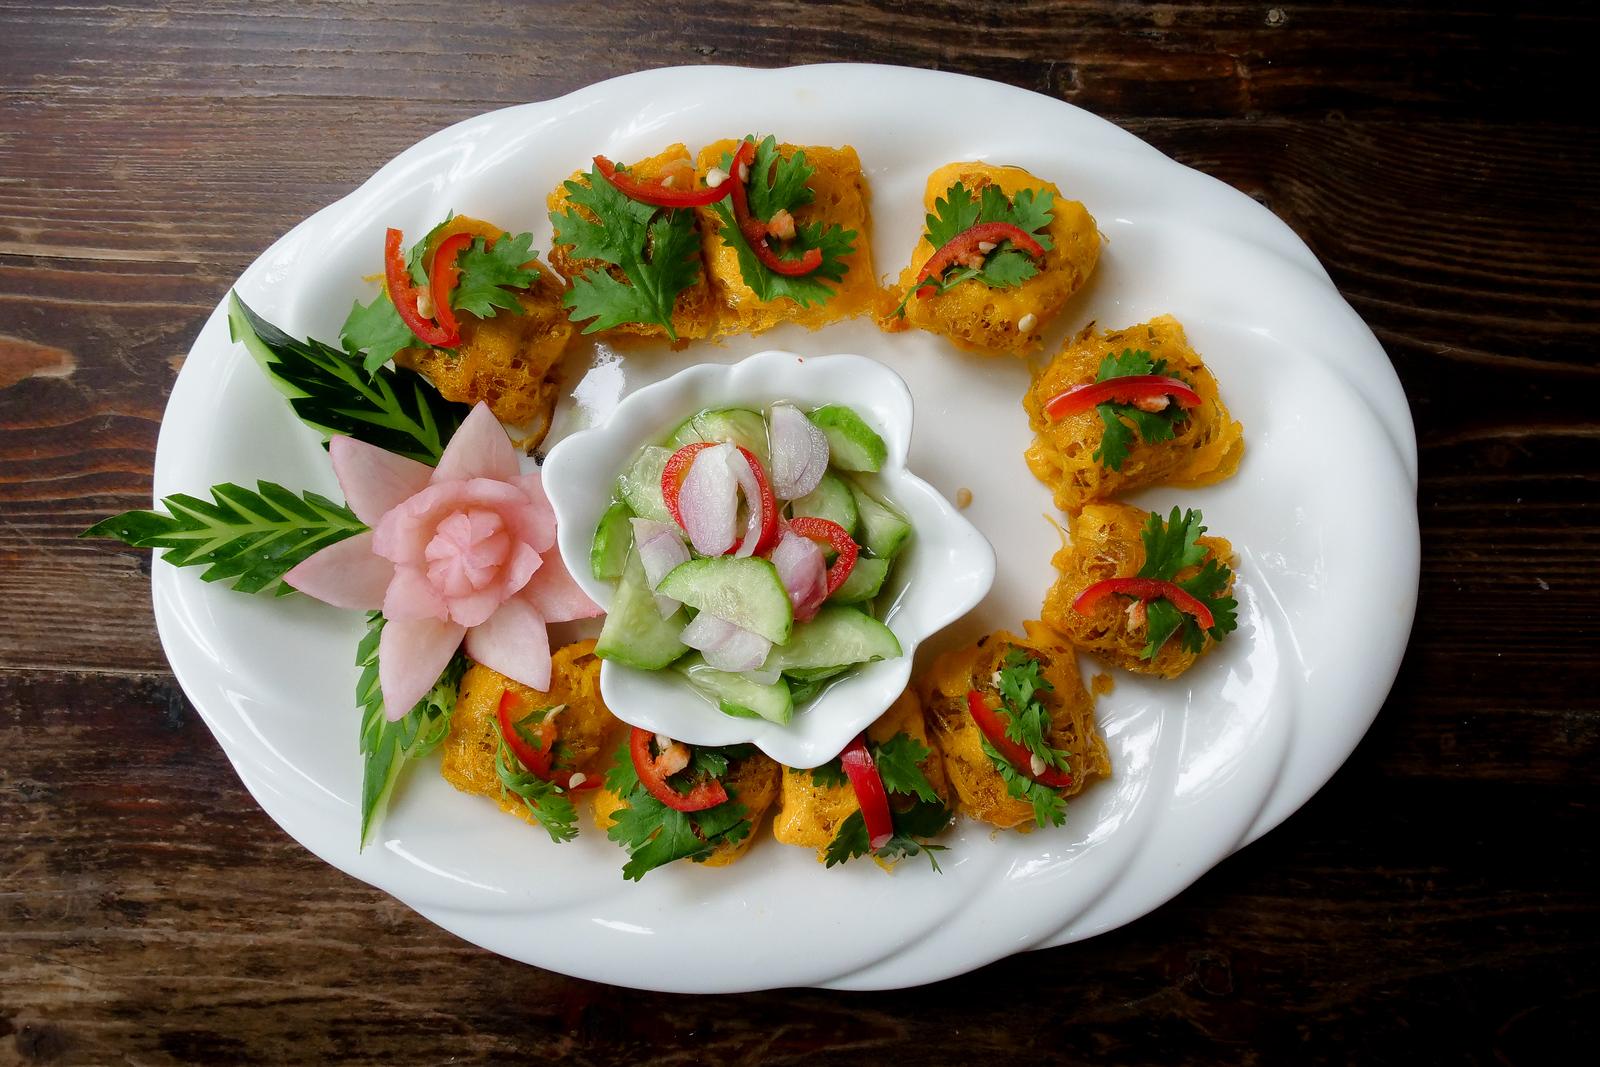 LA thiang街的房间是这家餐厅的华丽和精美可口的皇家传统泰菜